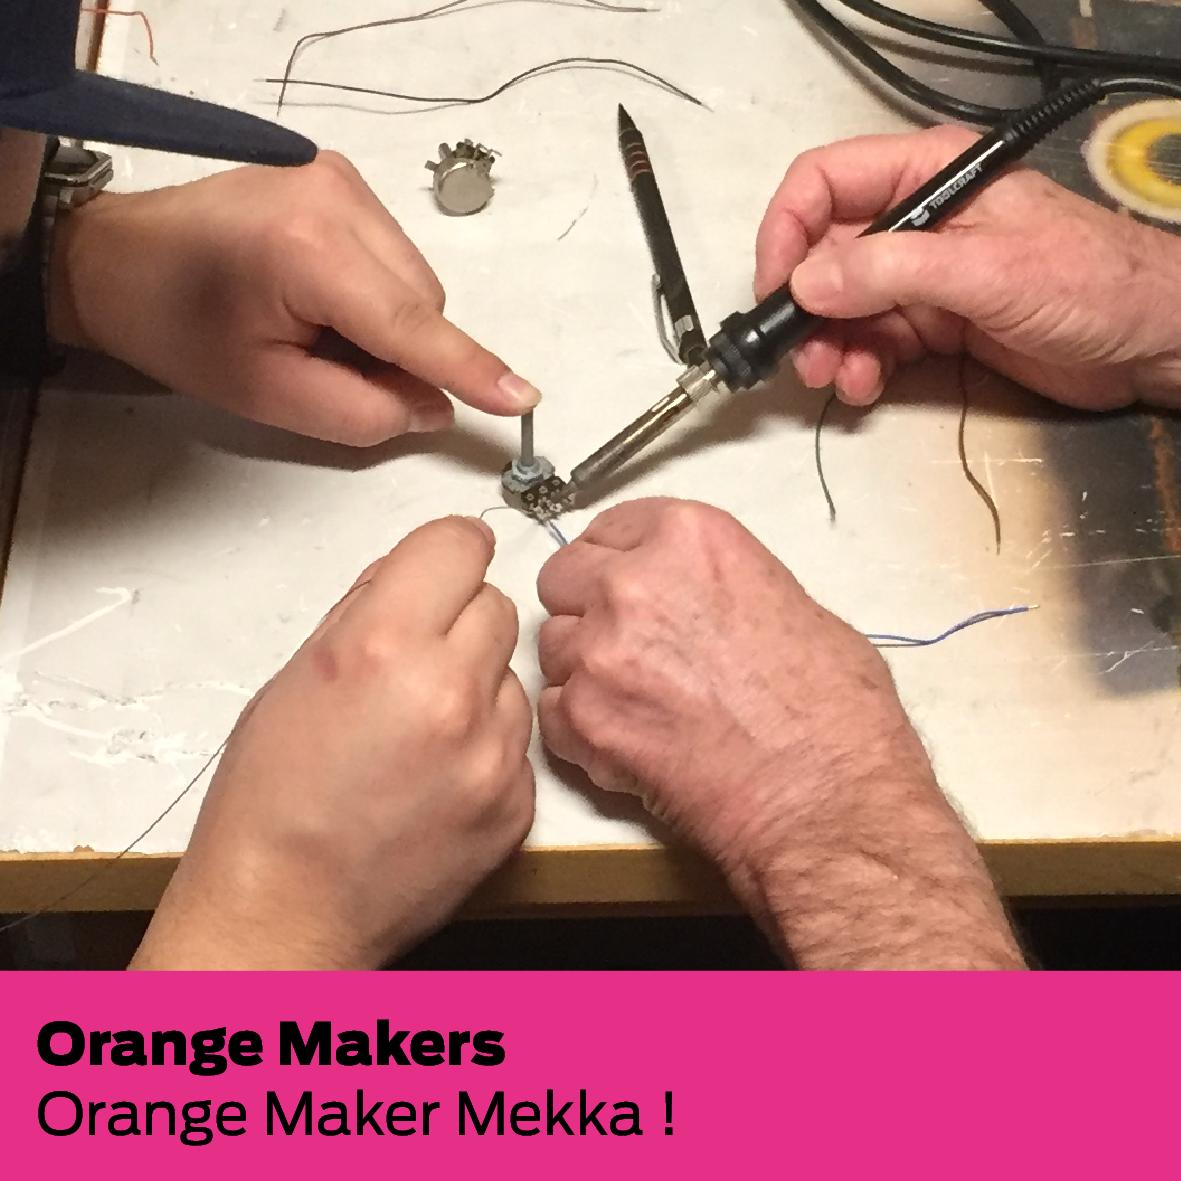 Orange Makers (DK): Orange Maker Mekka !